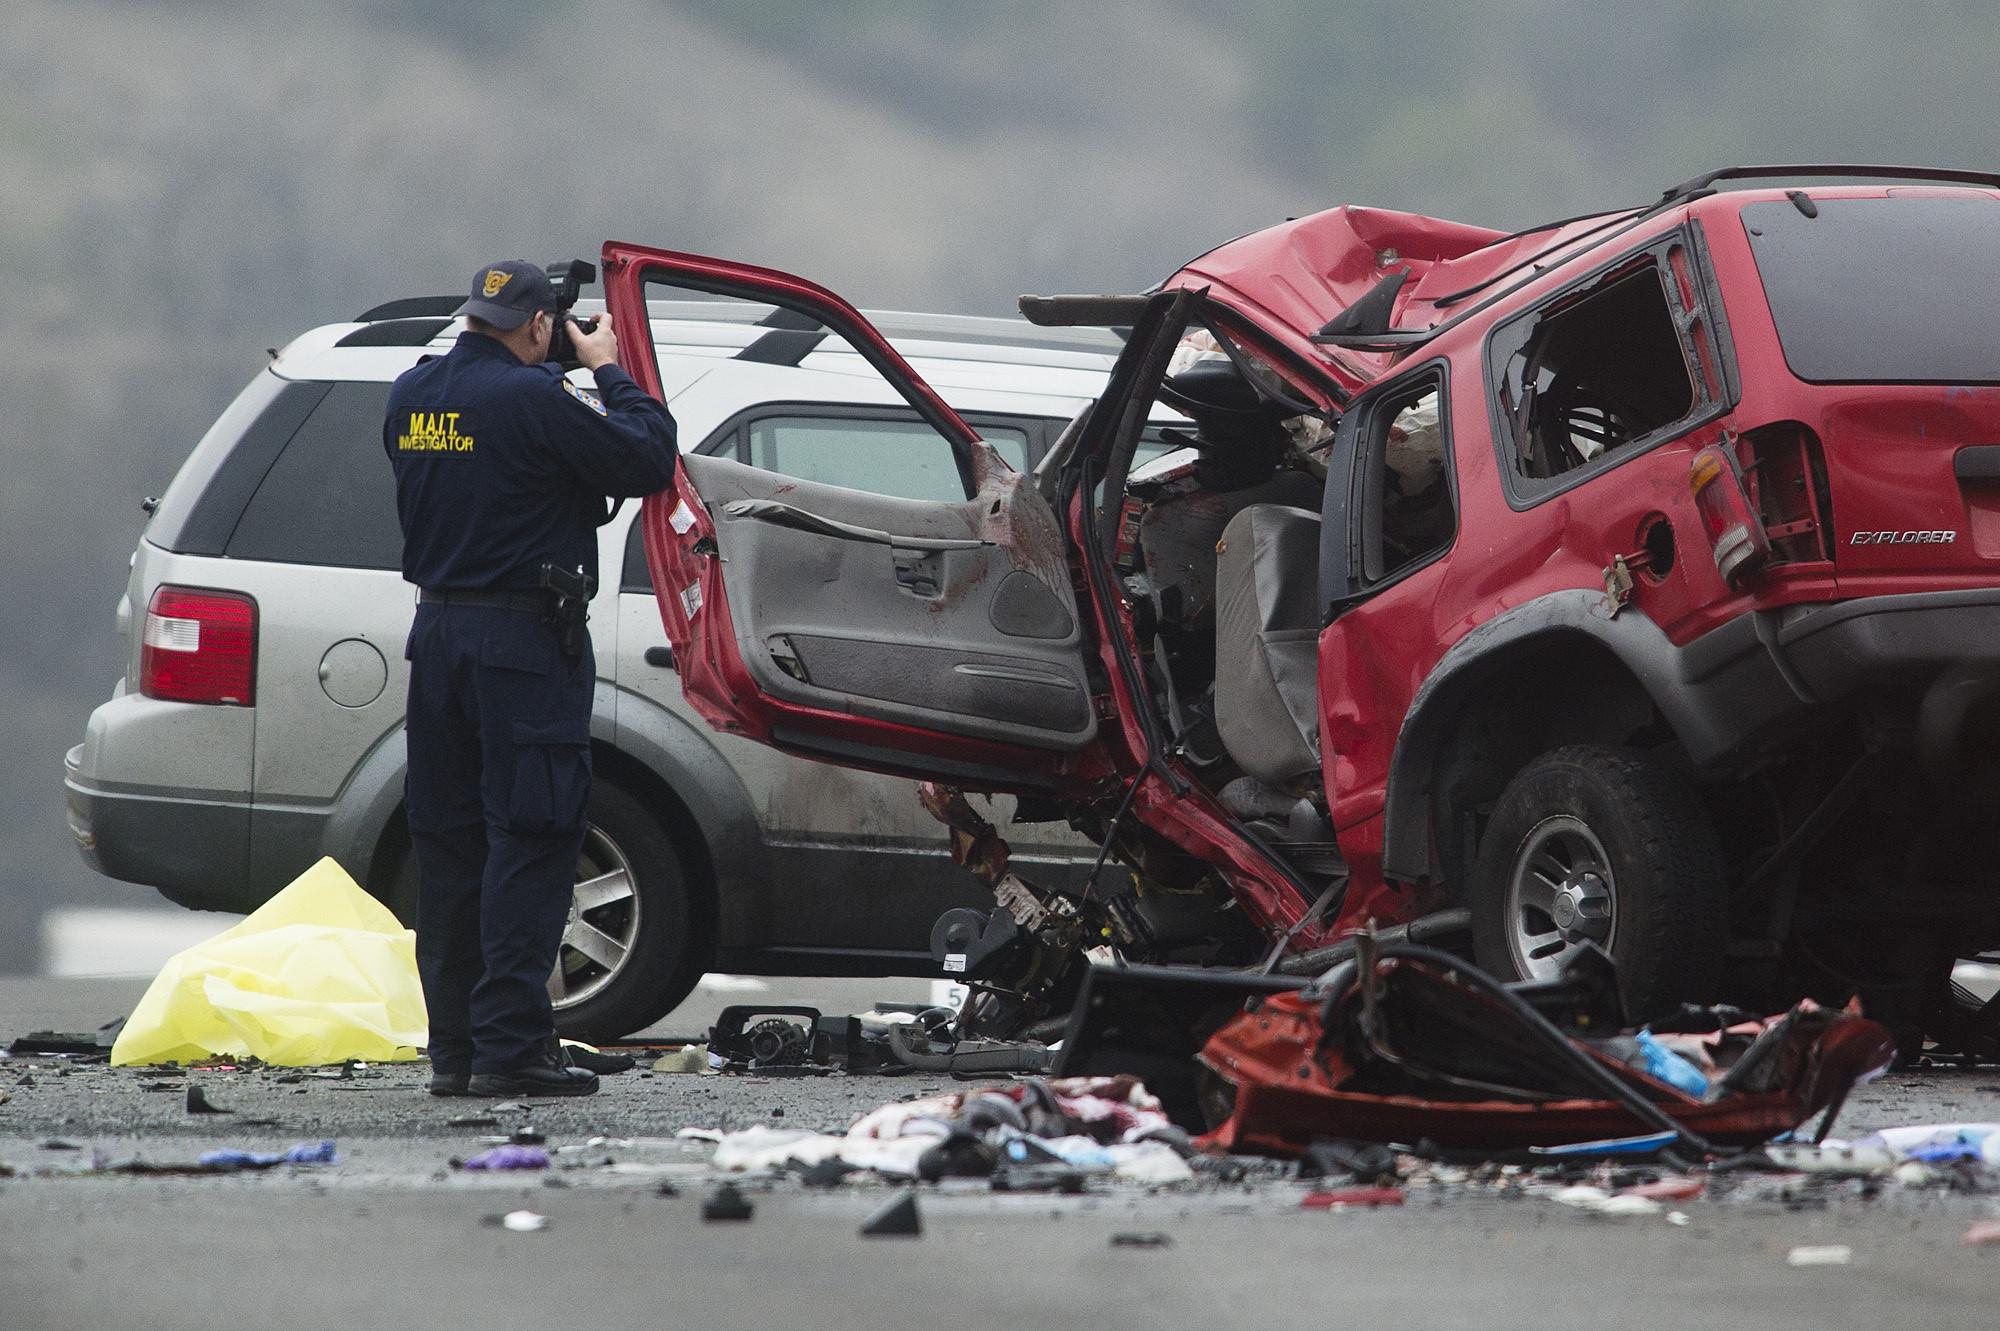 Suspect In Wrong Way Crash Has Previous Dui Conviction